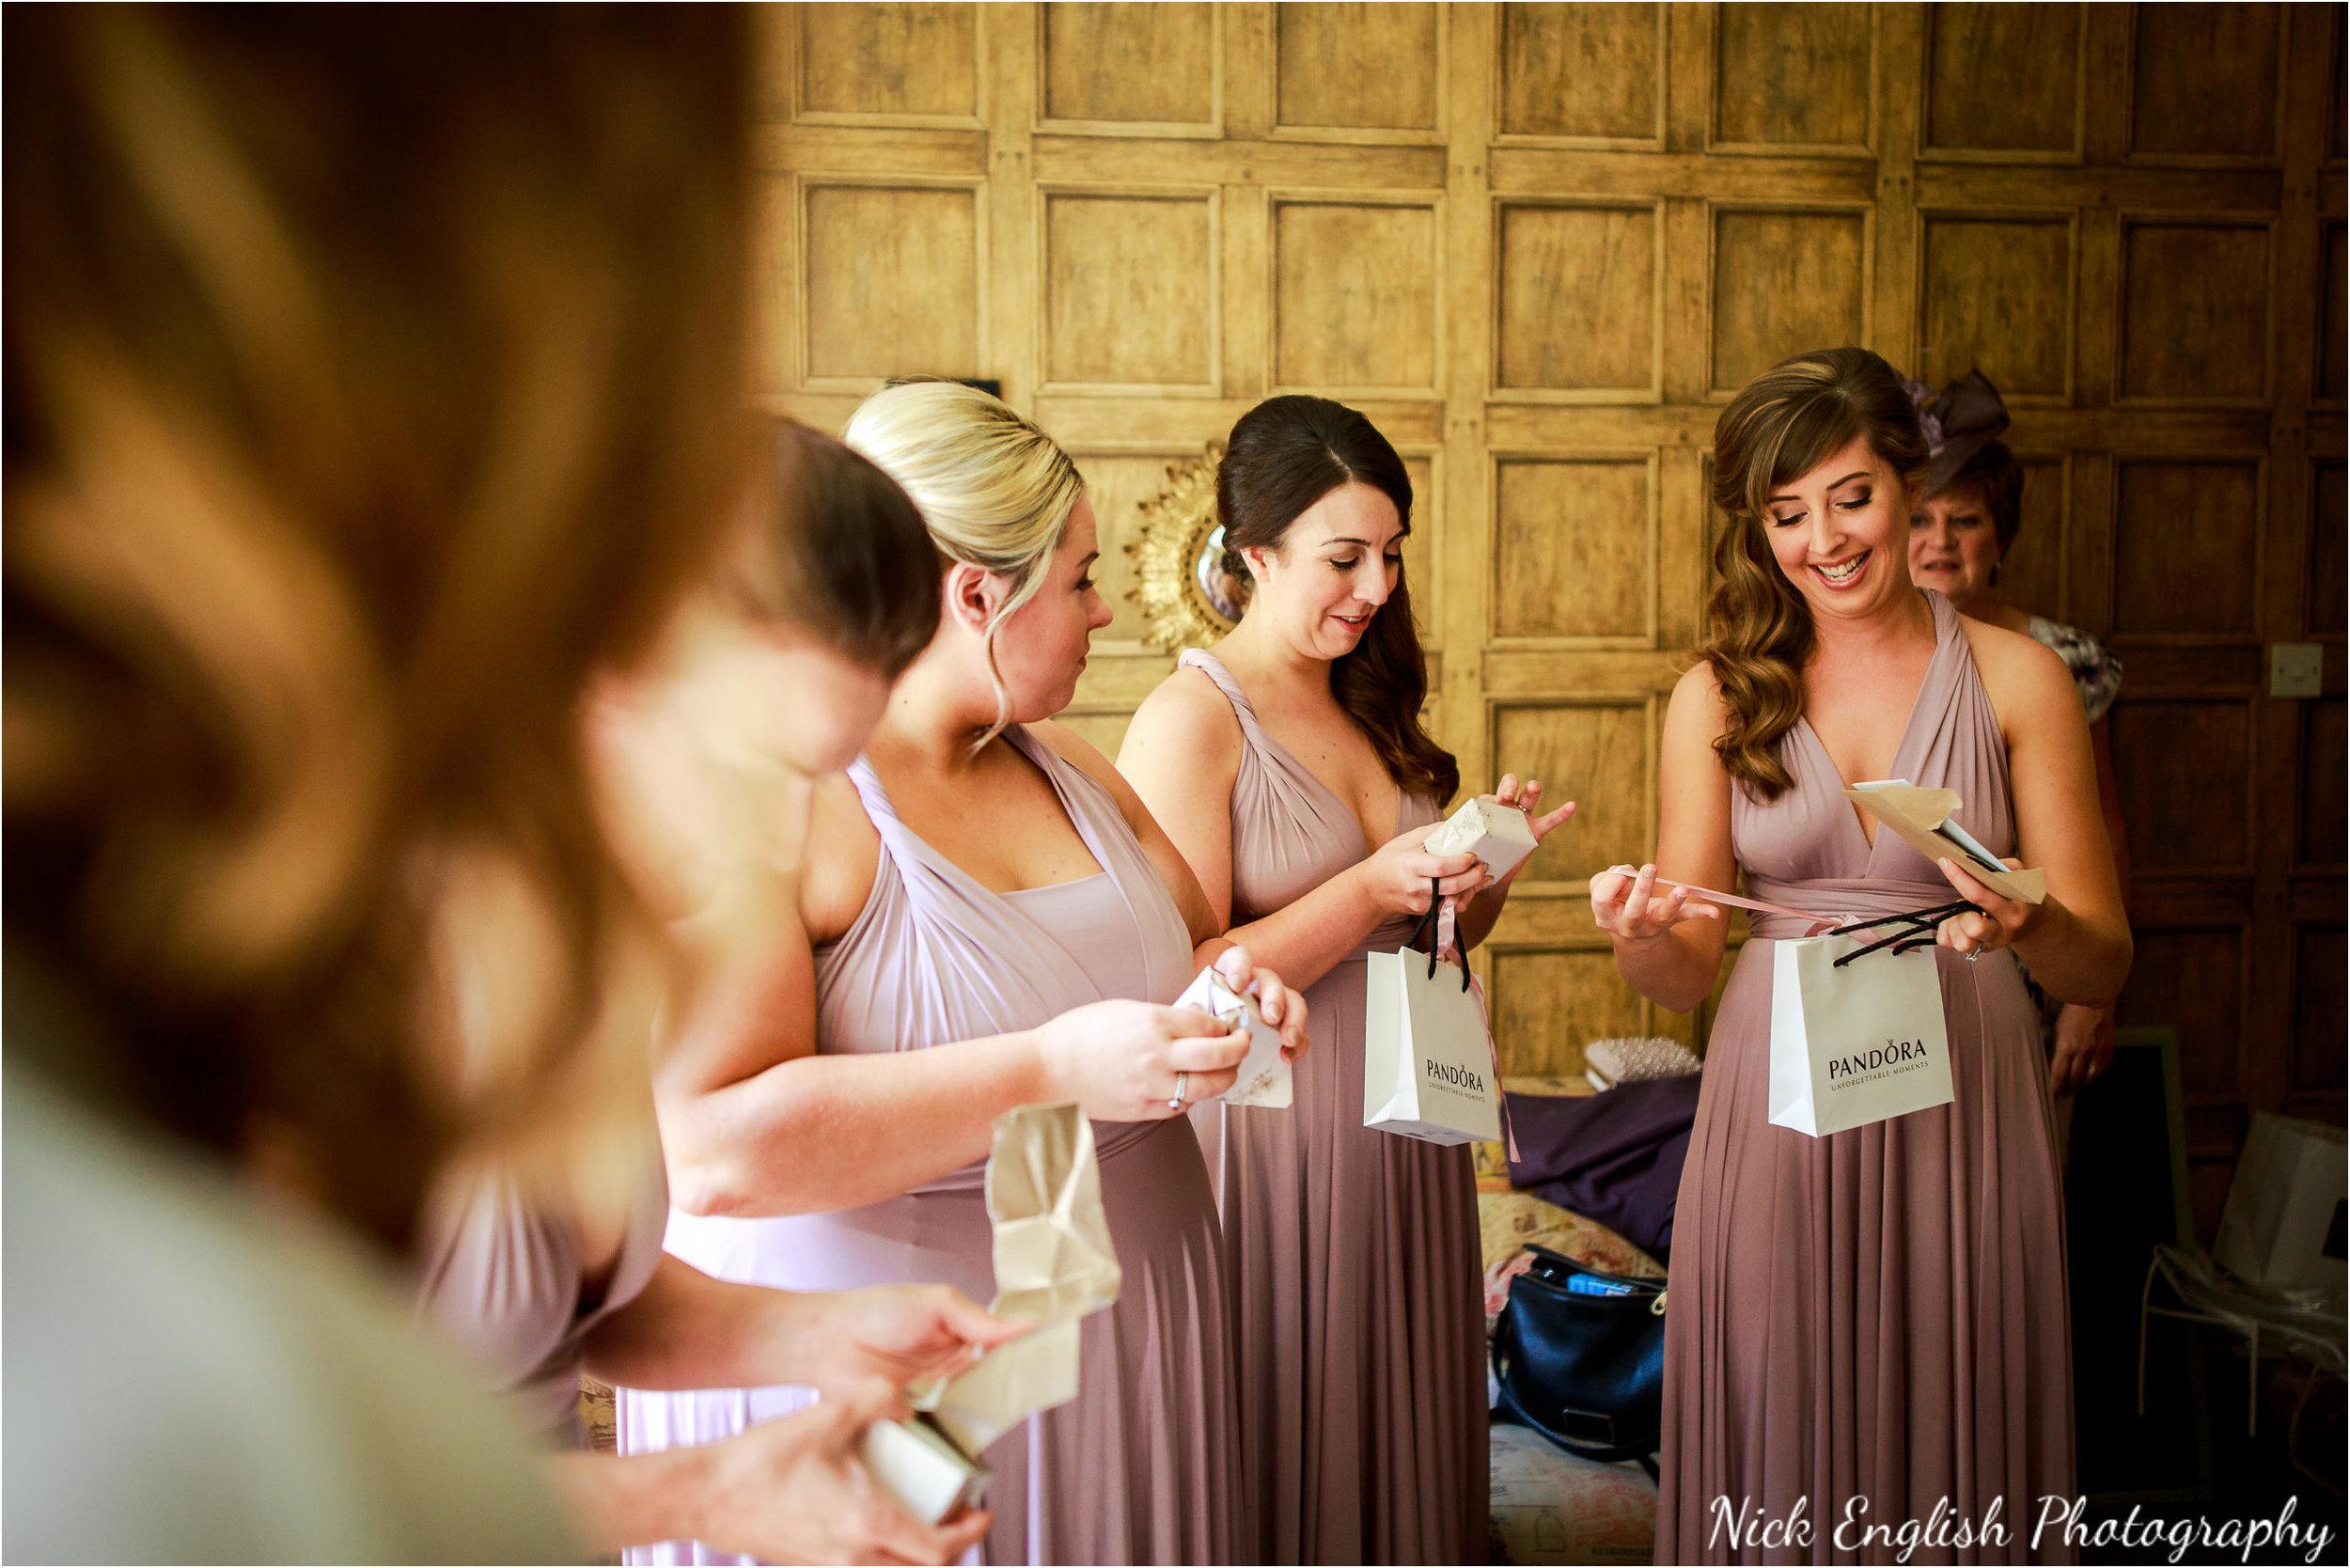 Alison James Wedding Photographs at Eaves Hall West Bradford 55jpg.jpeg